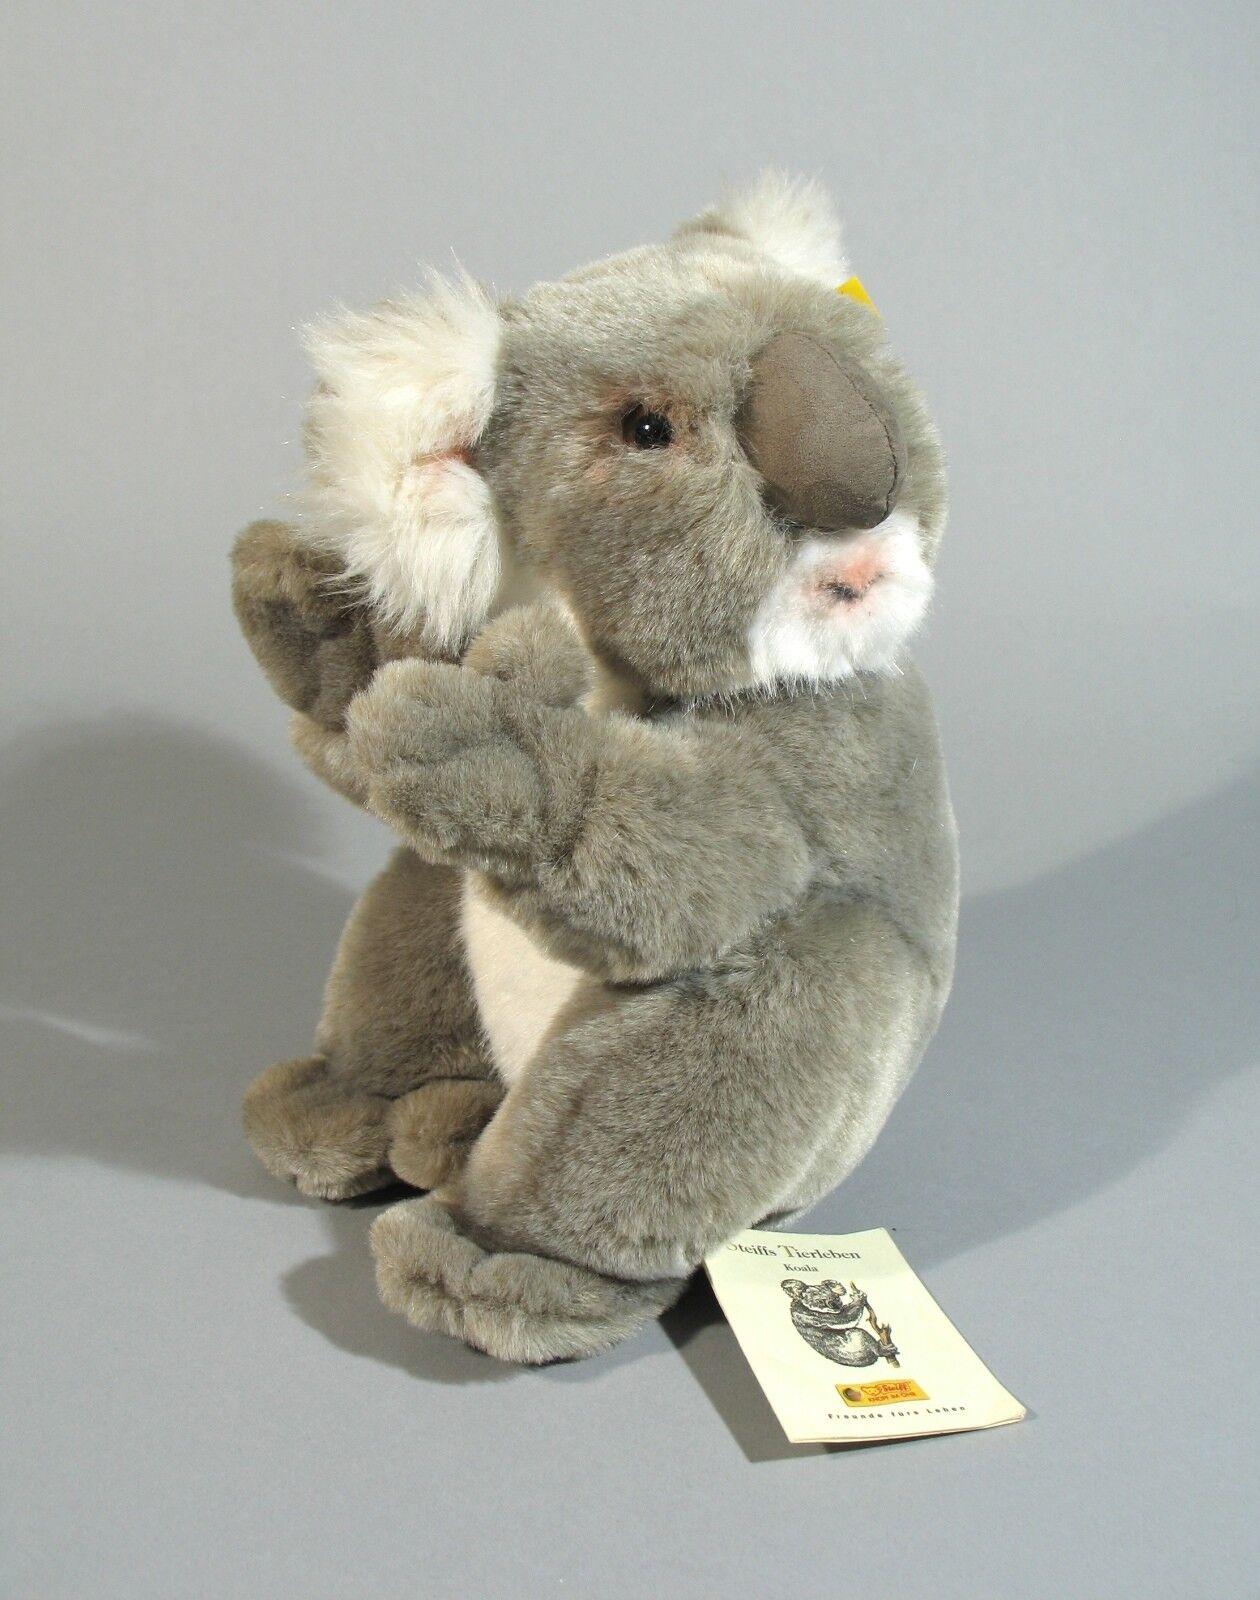 Steiff Koala Baby Baby Koala060113 23cm 2001-2003 KFS mit Waschanleitung Top